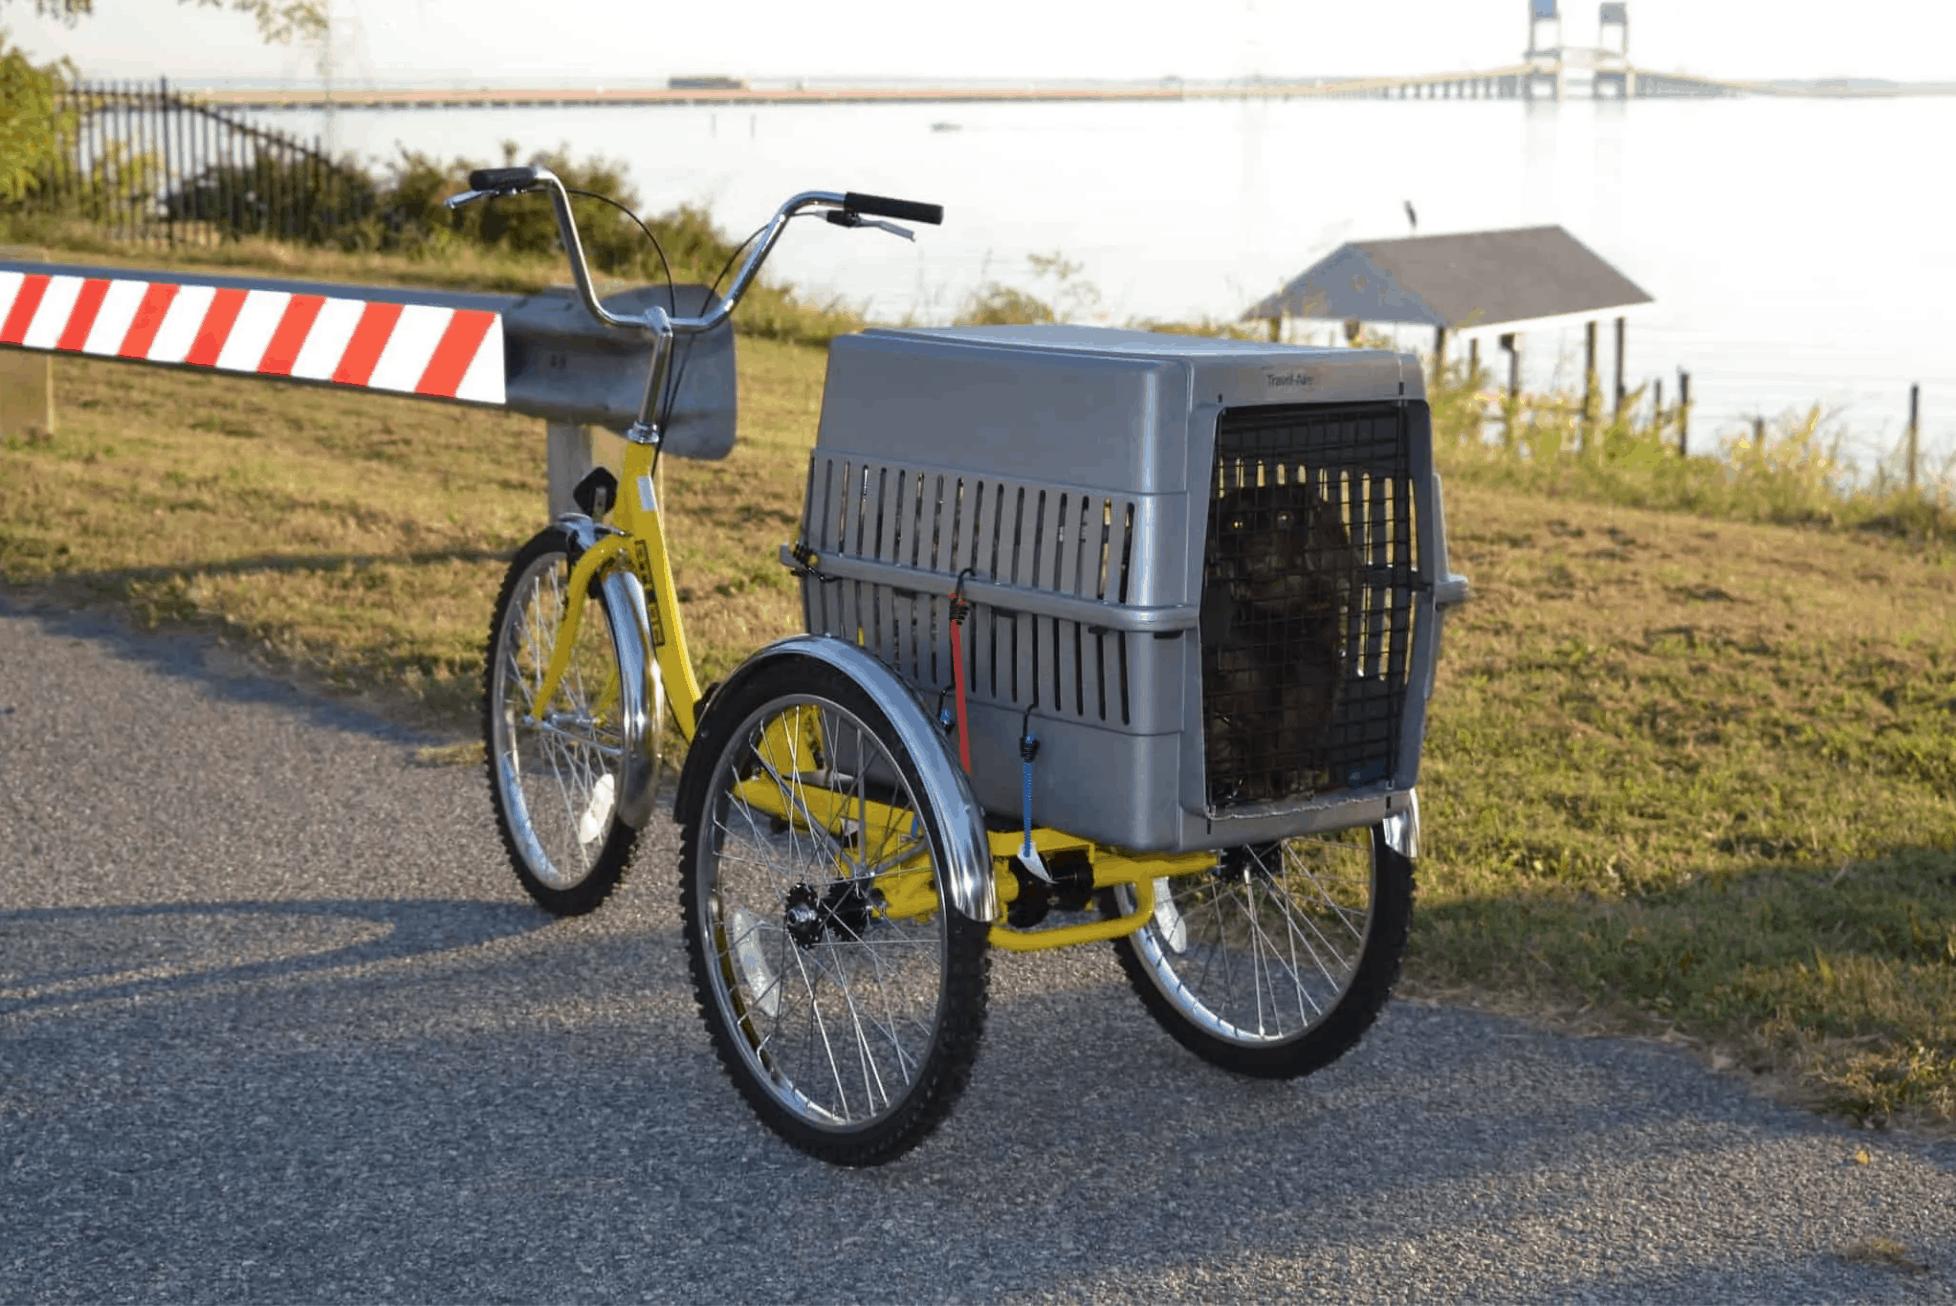 dog in crate on bike